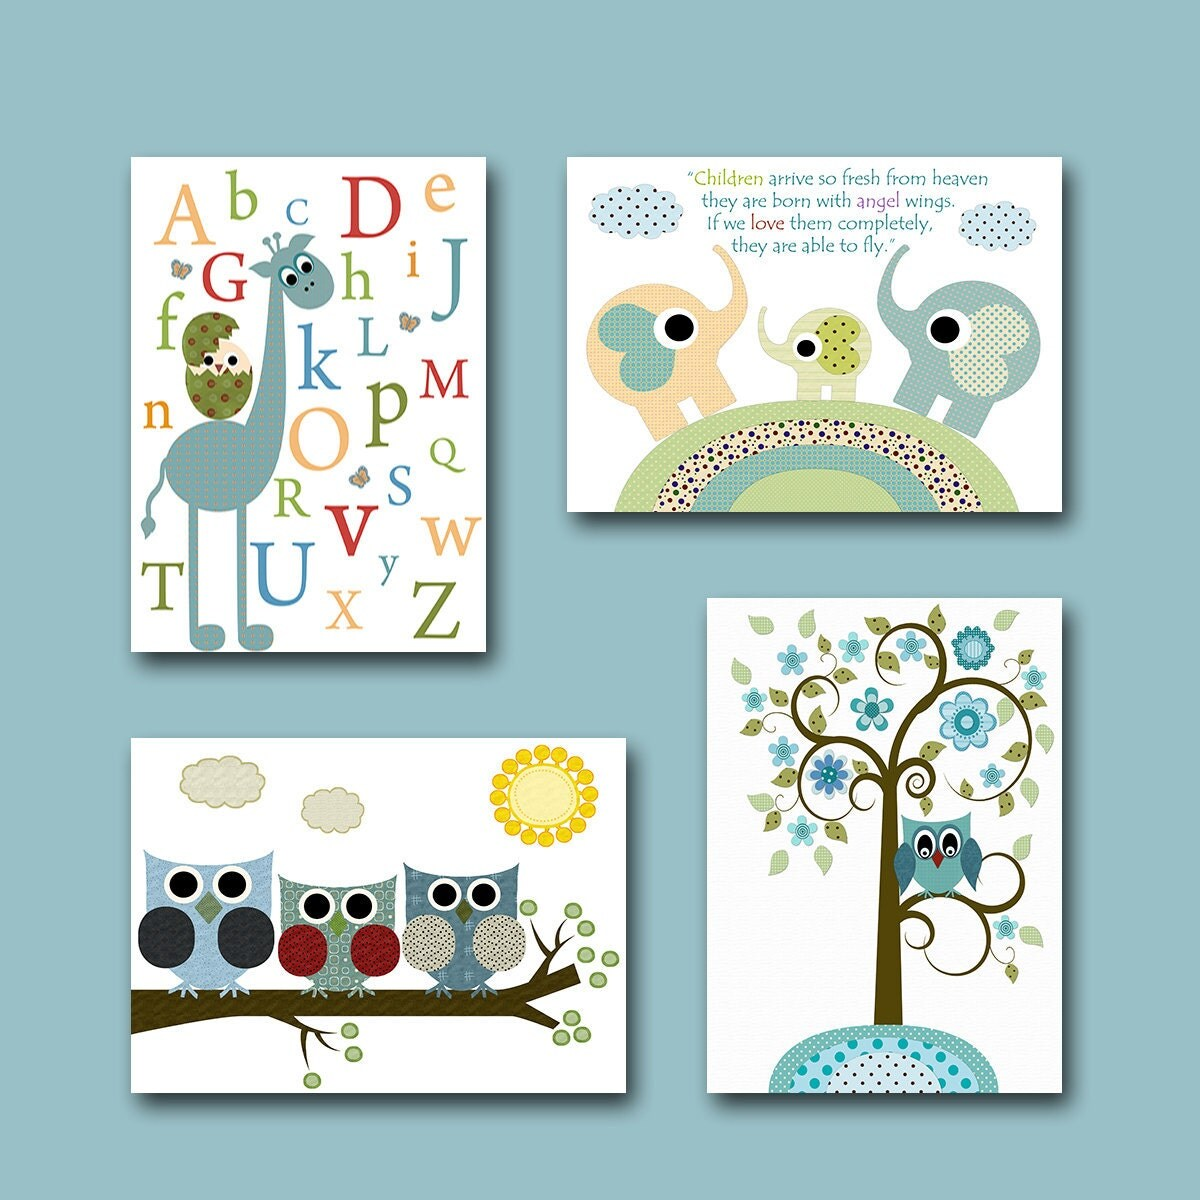 Baby Room Decor Nursery Decor Nursery Boy Kids Art By: Childrens Wall Art Baby Room Decor Owls Baby Boy Nursery Print